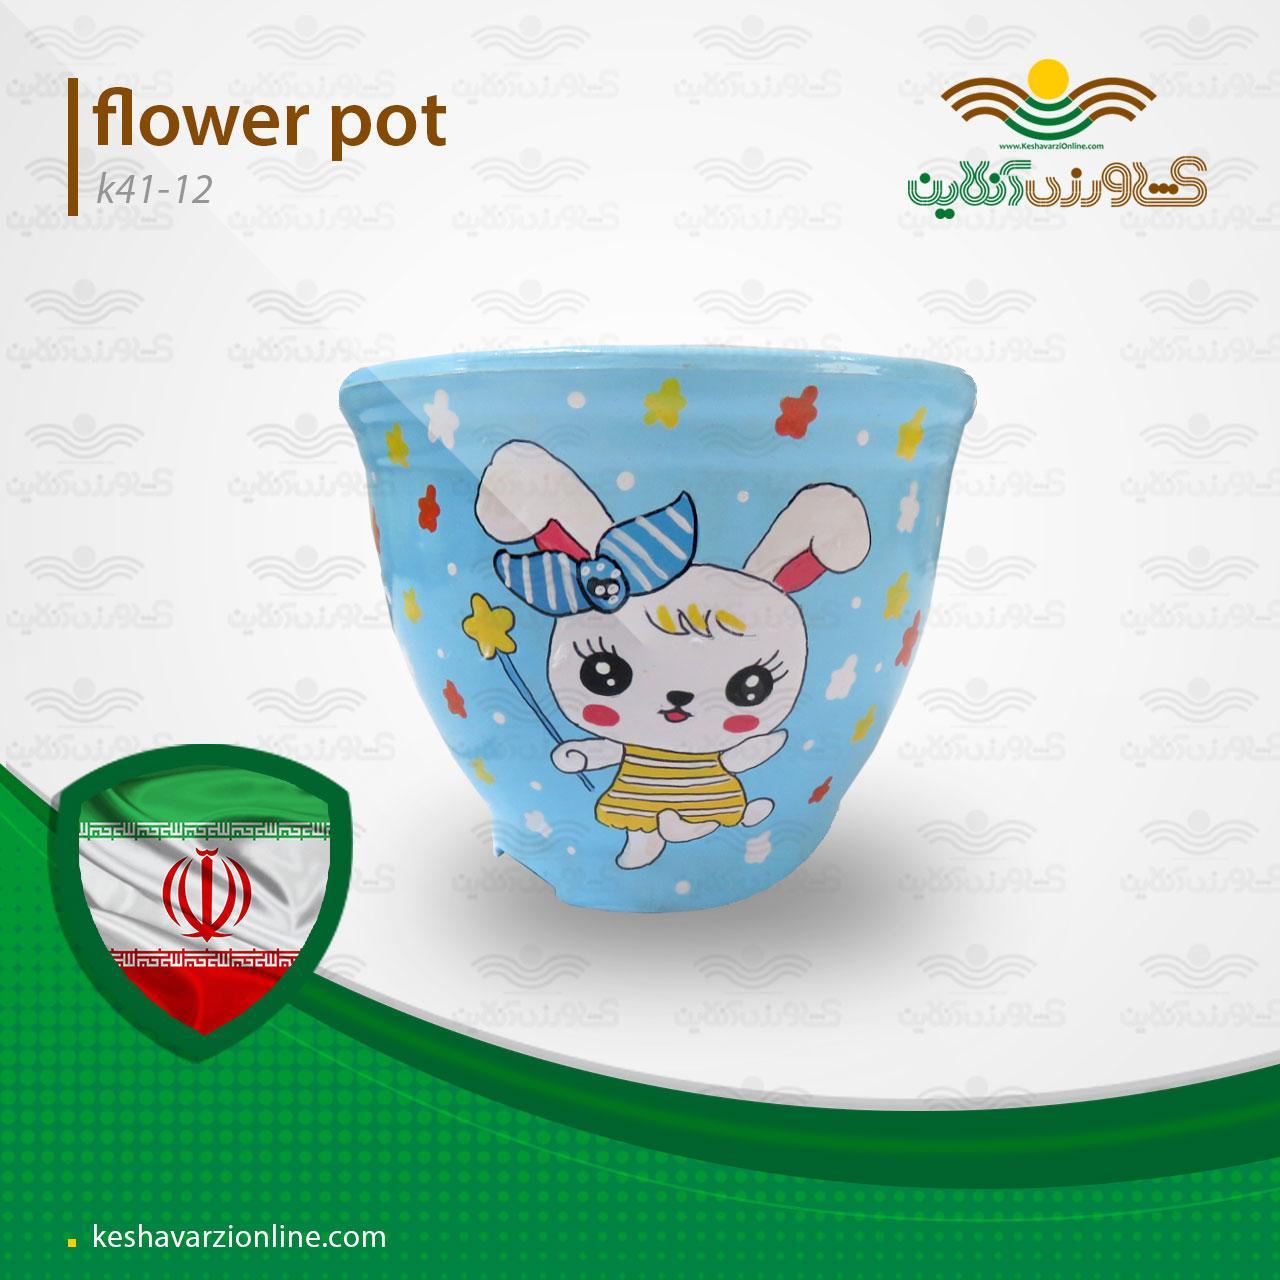 گلدان دکوری K41.12